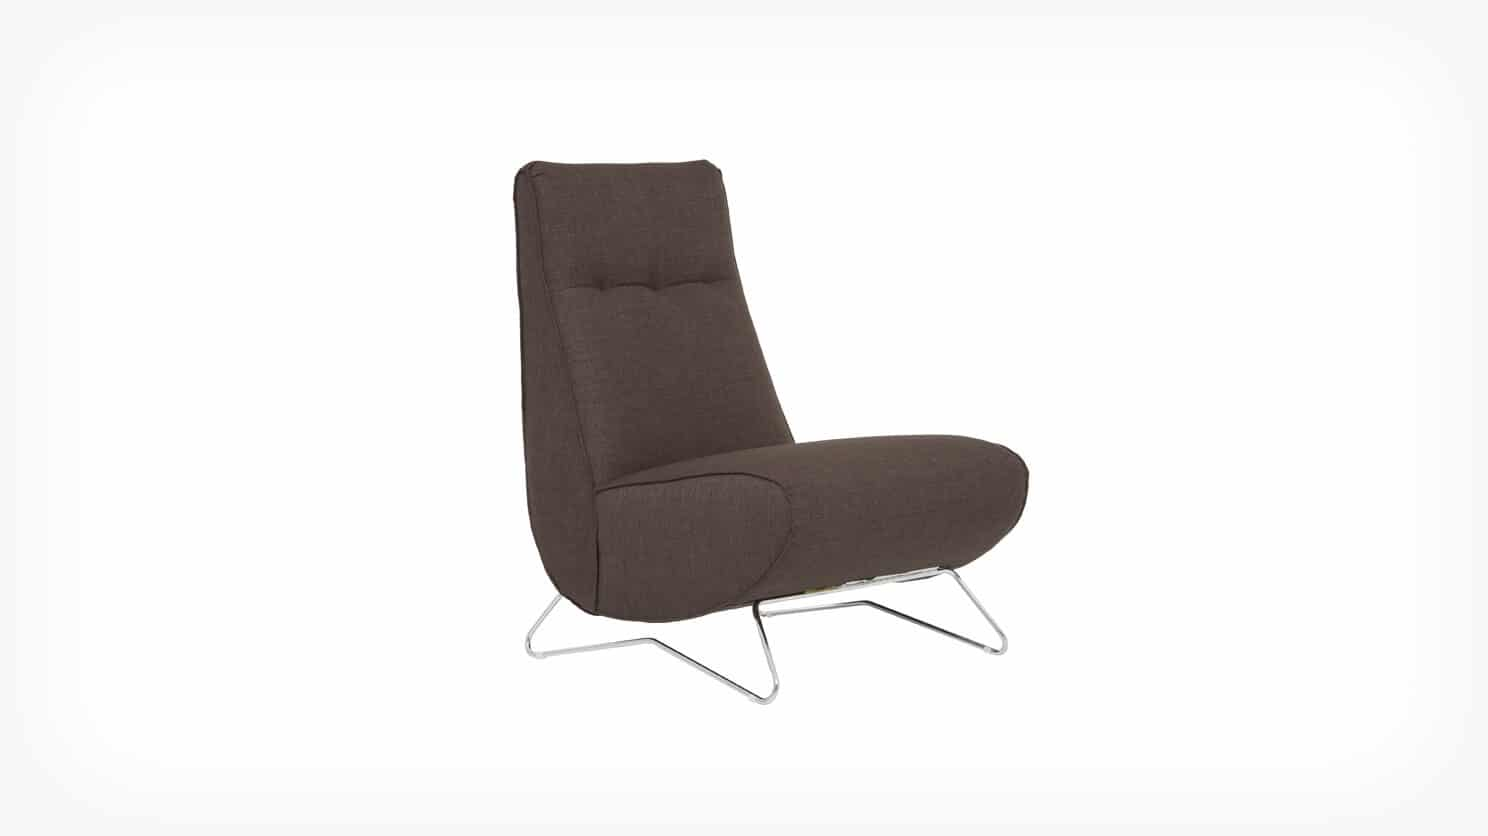 30022 02 2 chairs mollie chair polo slate corner